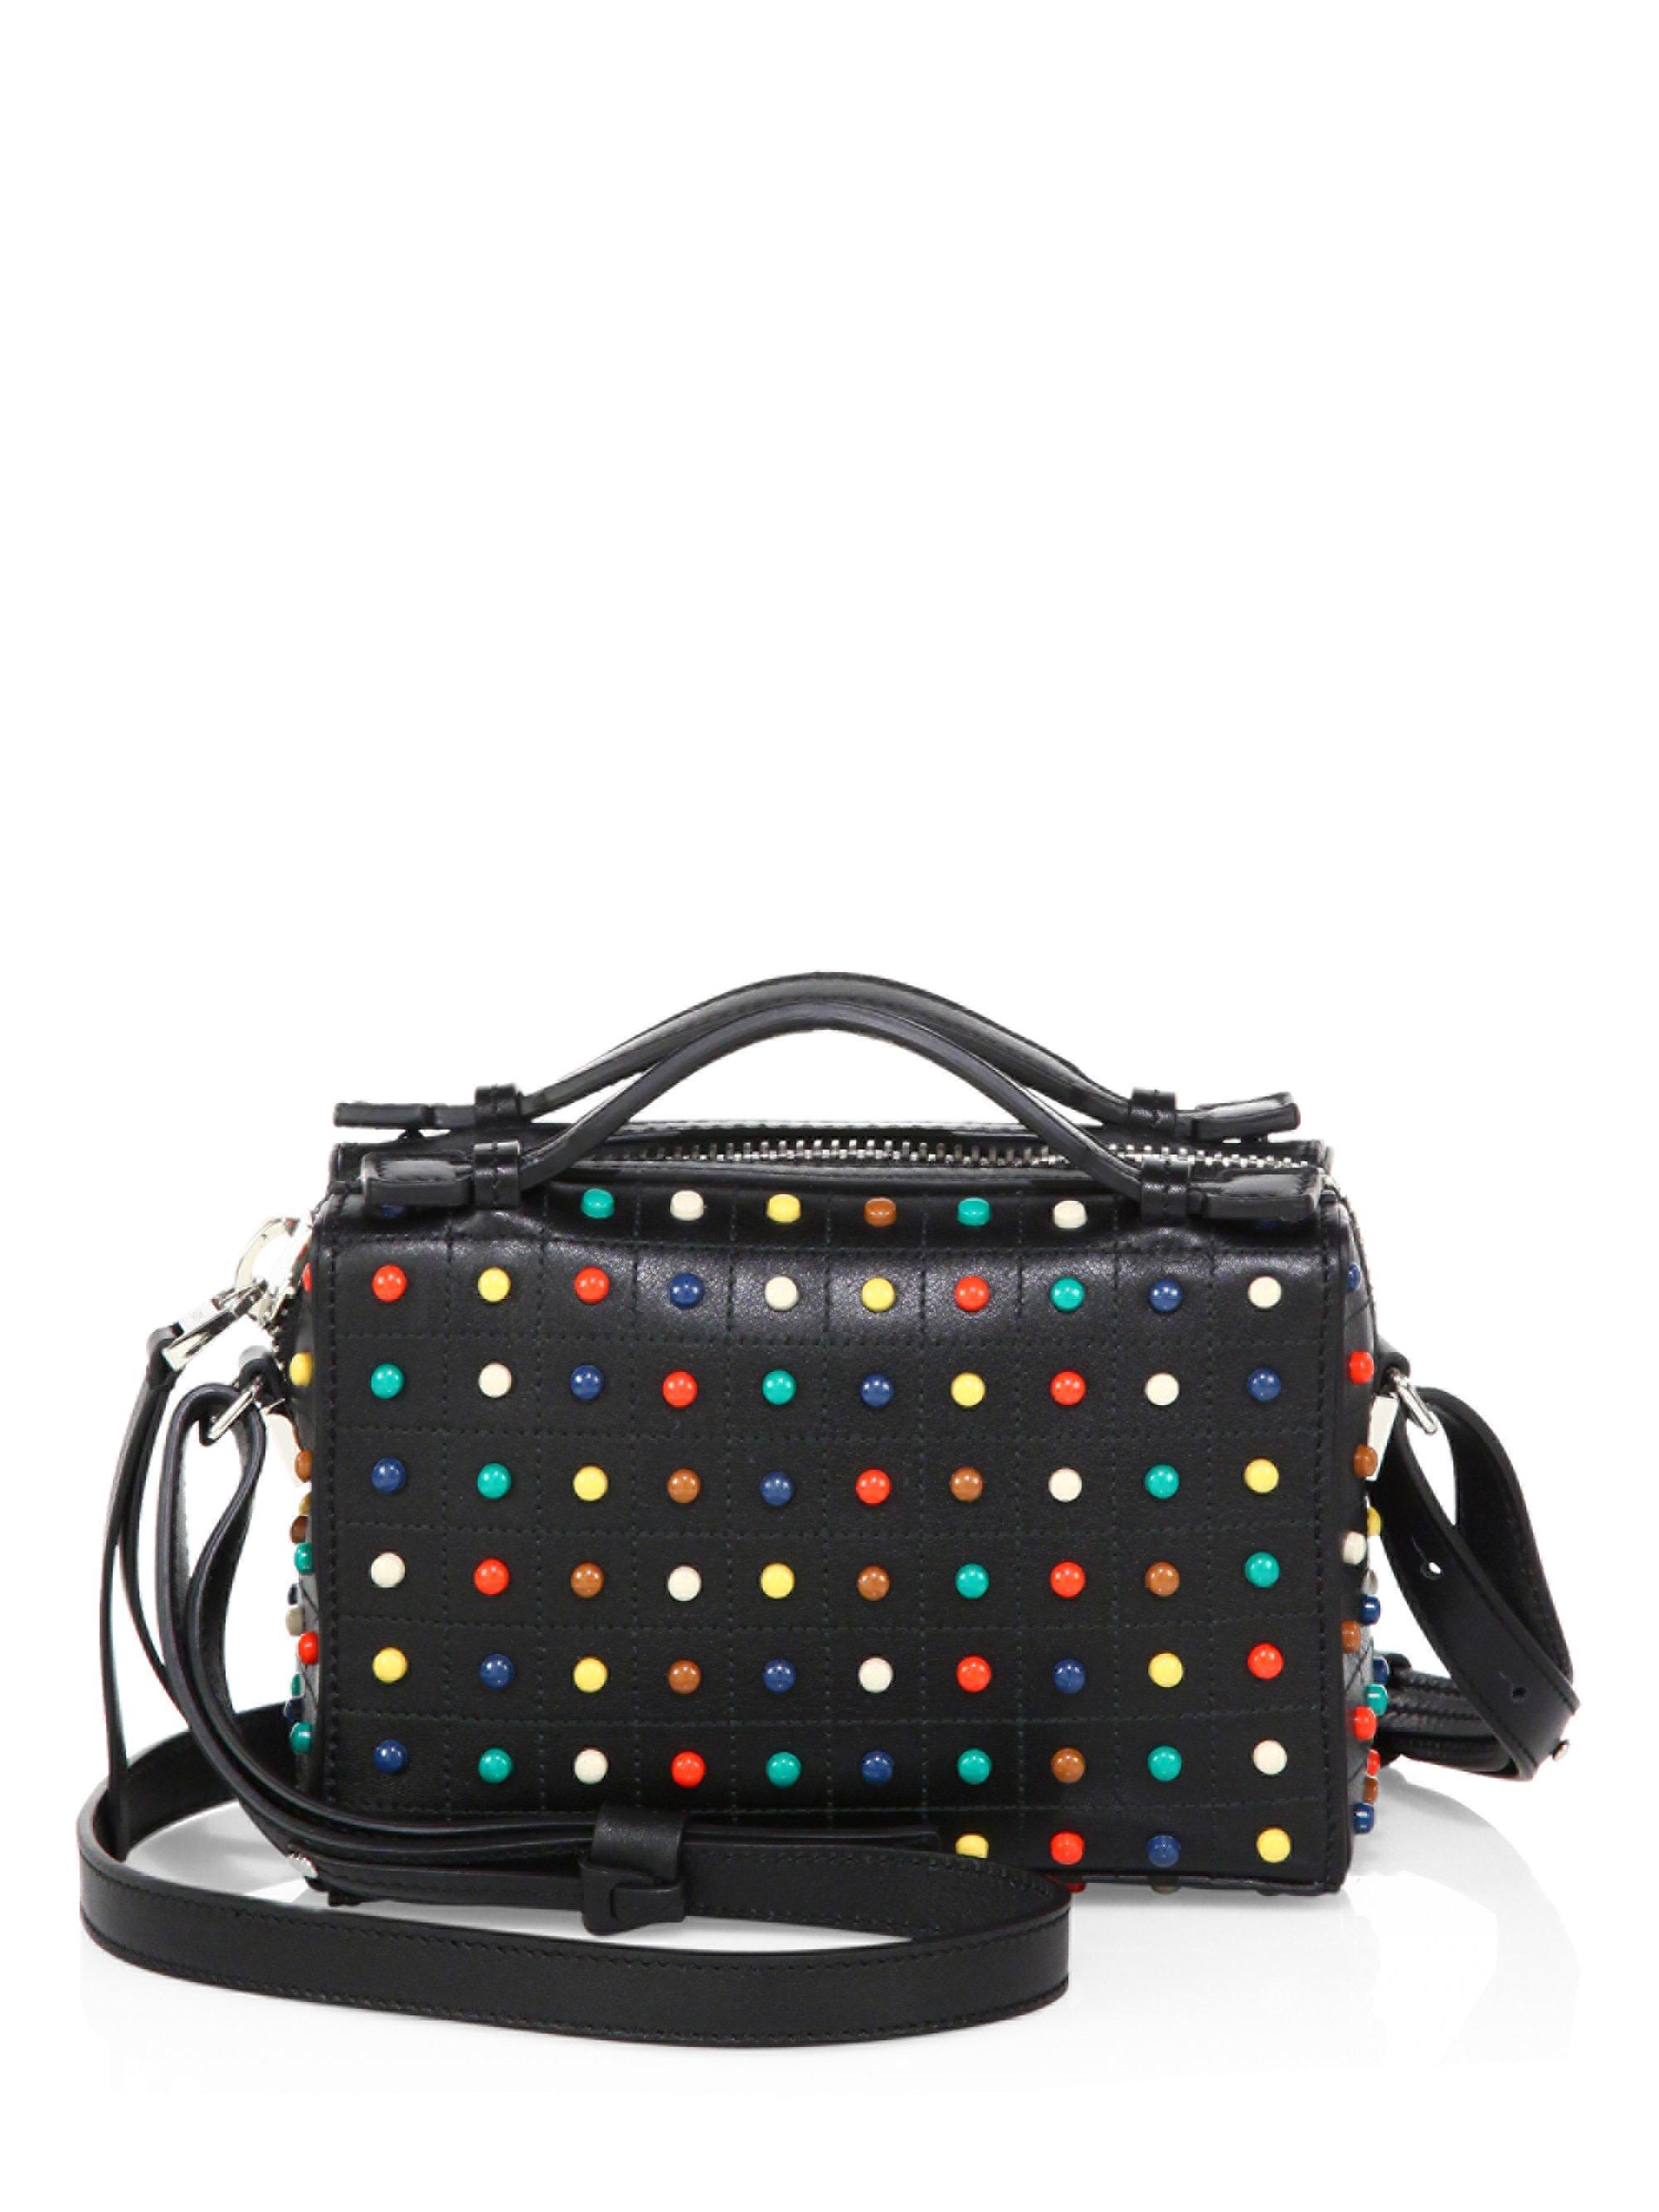 Gommino crossbody bag - Black Tod's FyyOKj